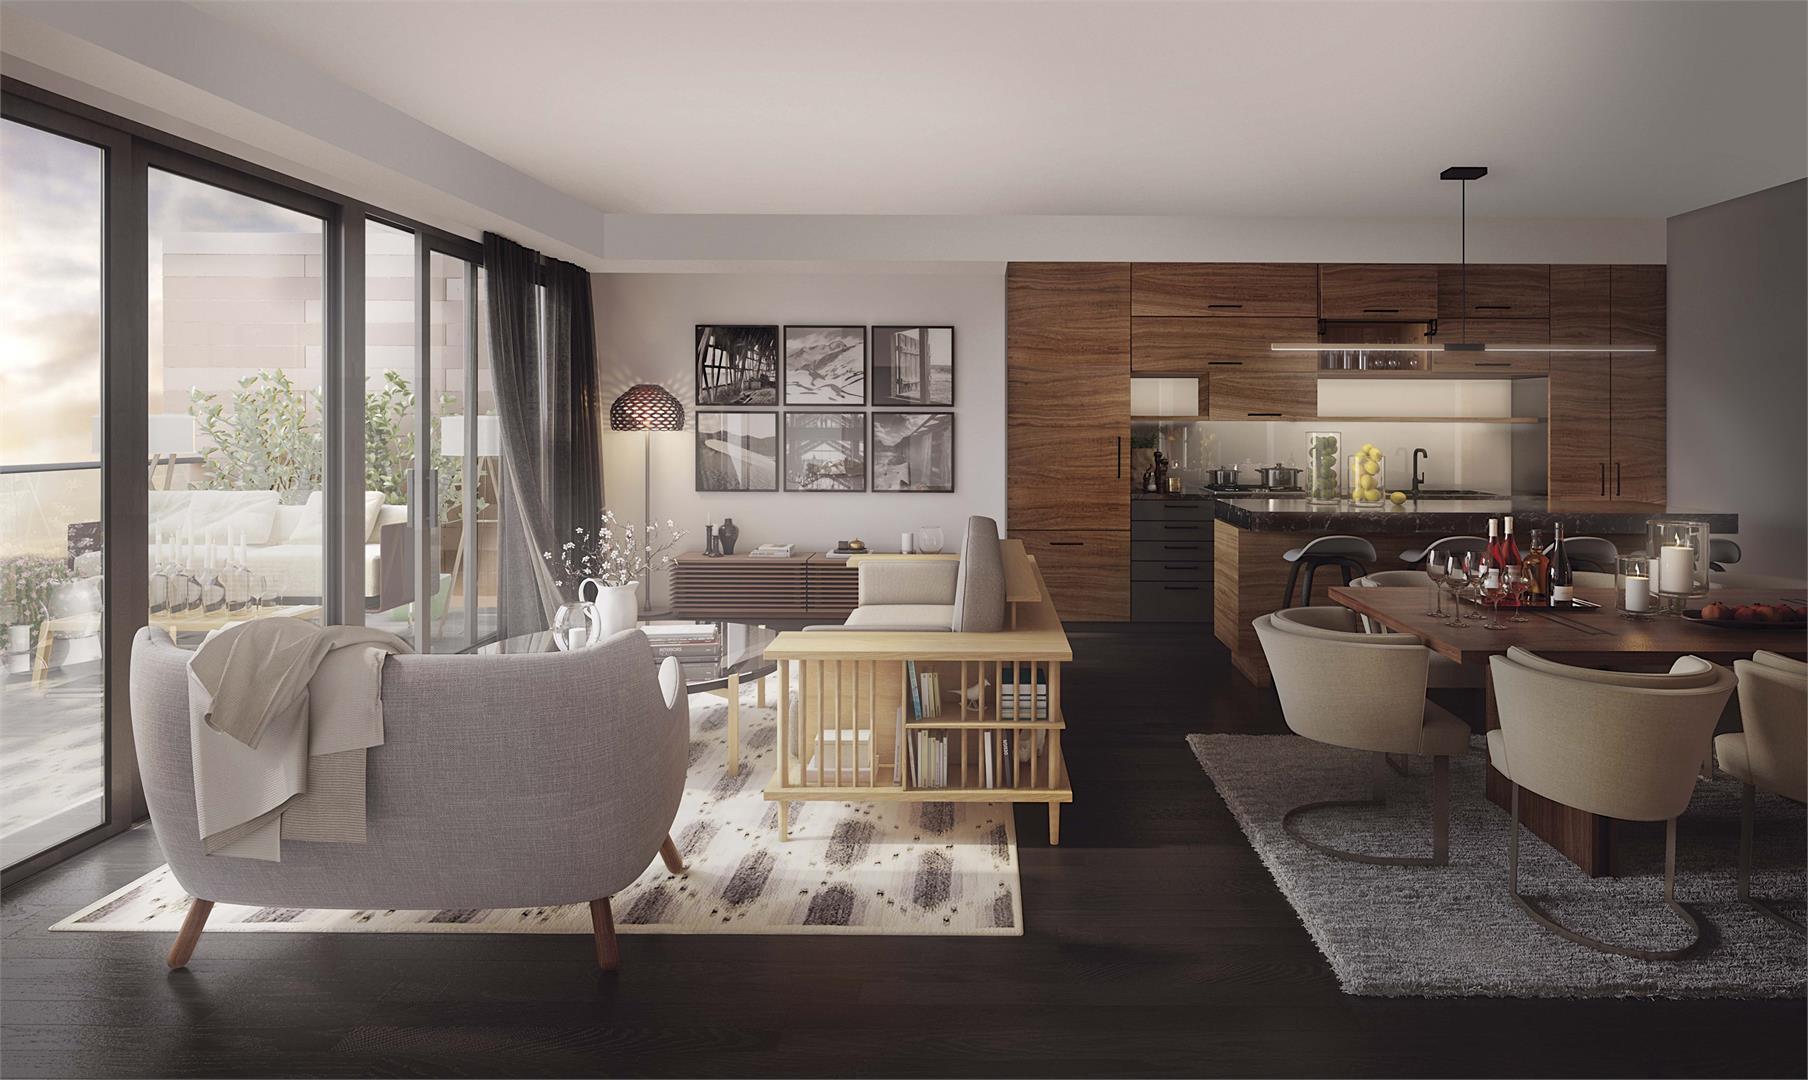 Rendering of Heartwood the Beach Condos suite interior